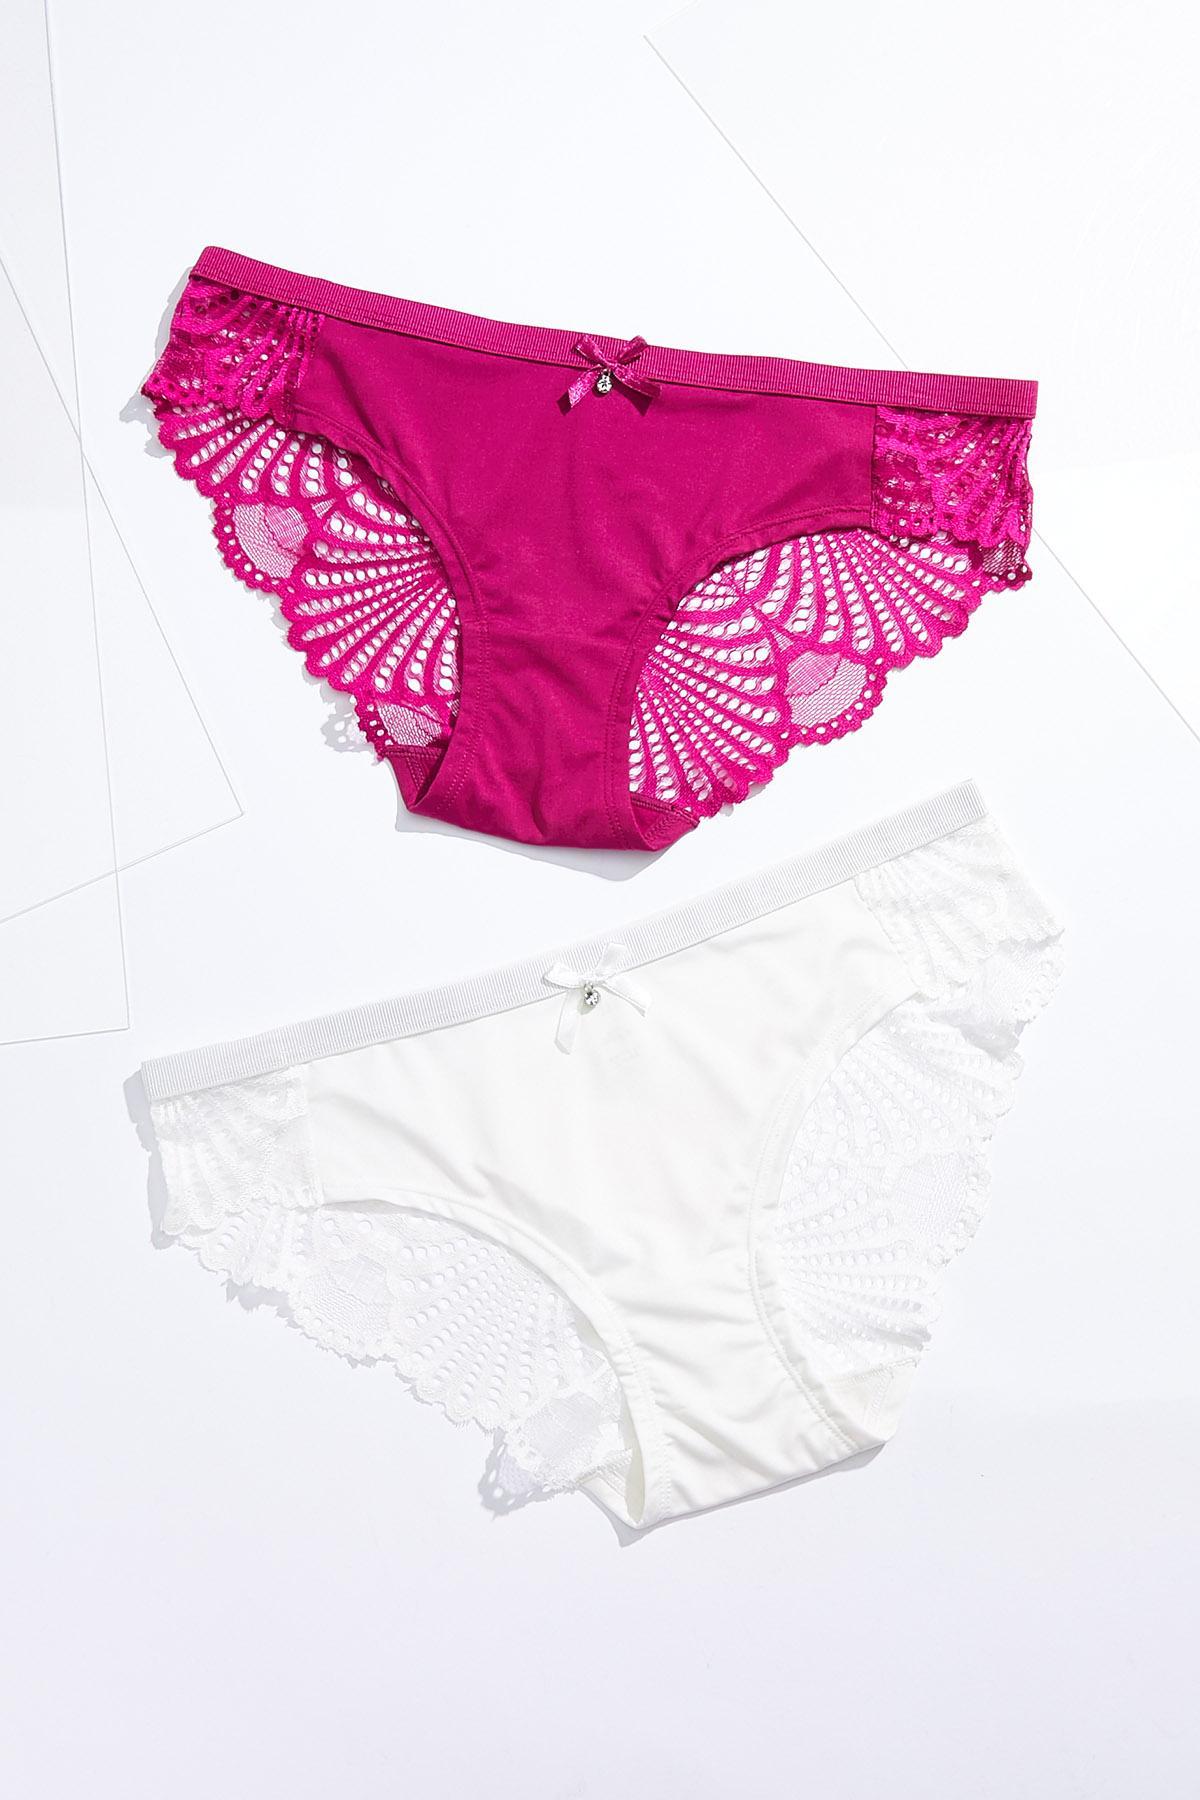 Lace Trim Hipster Panty Set